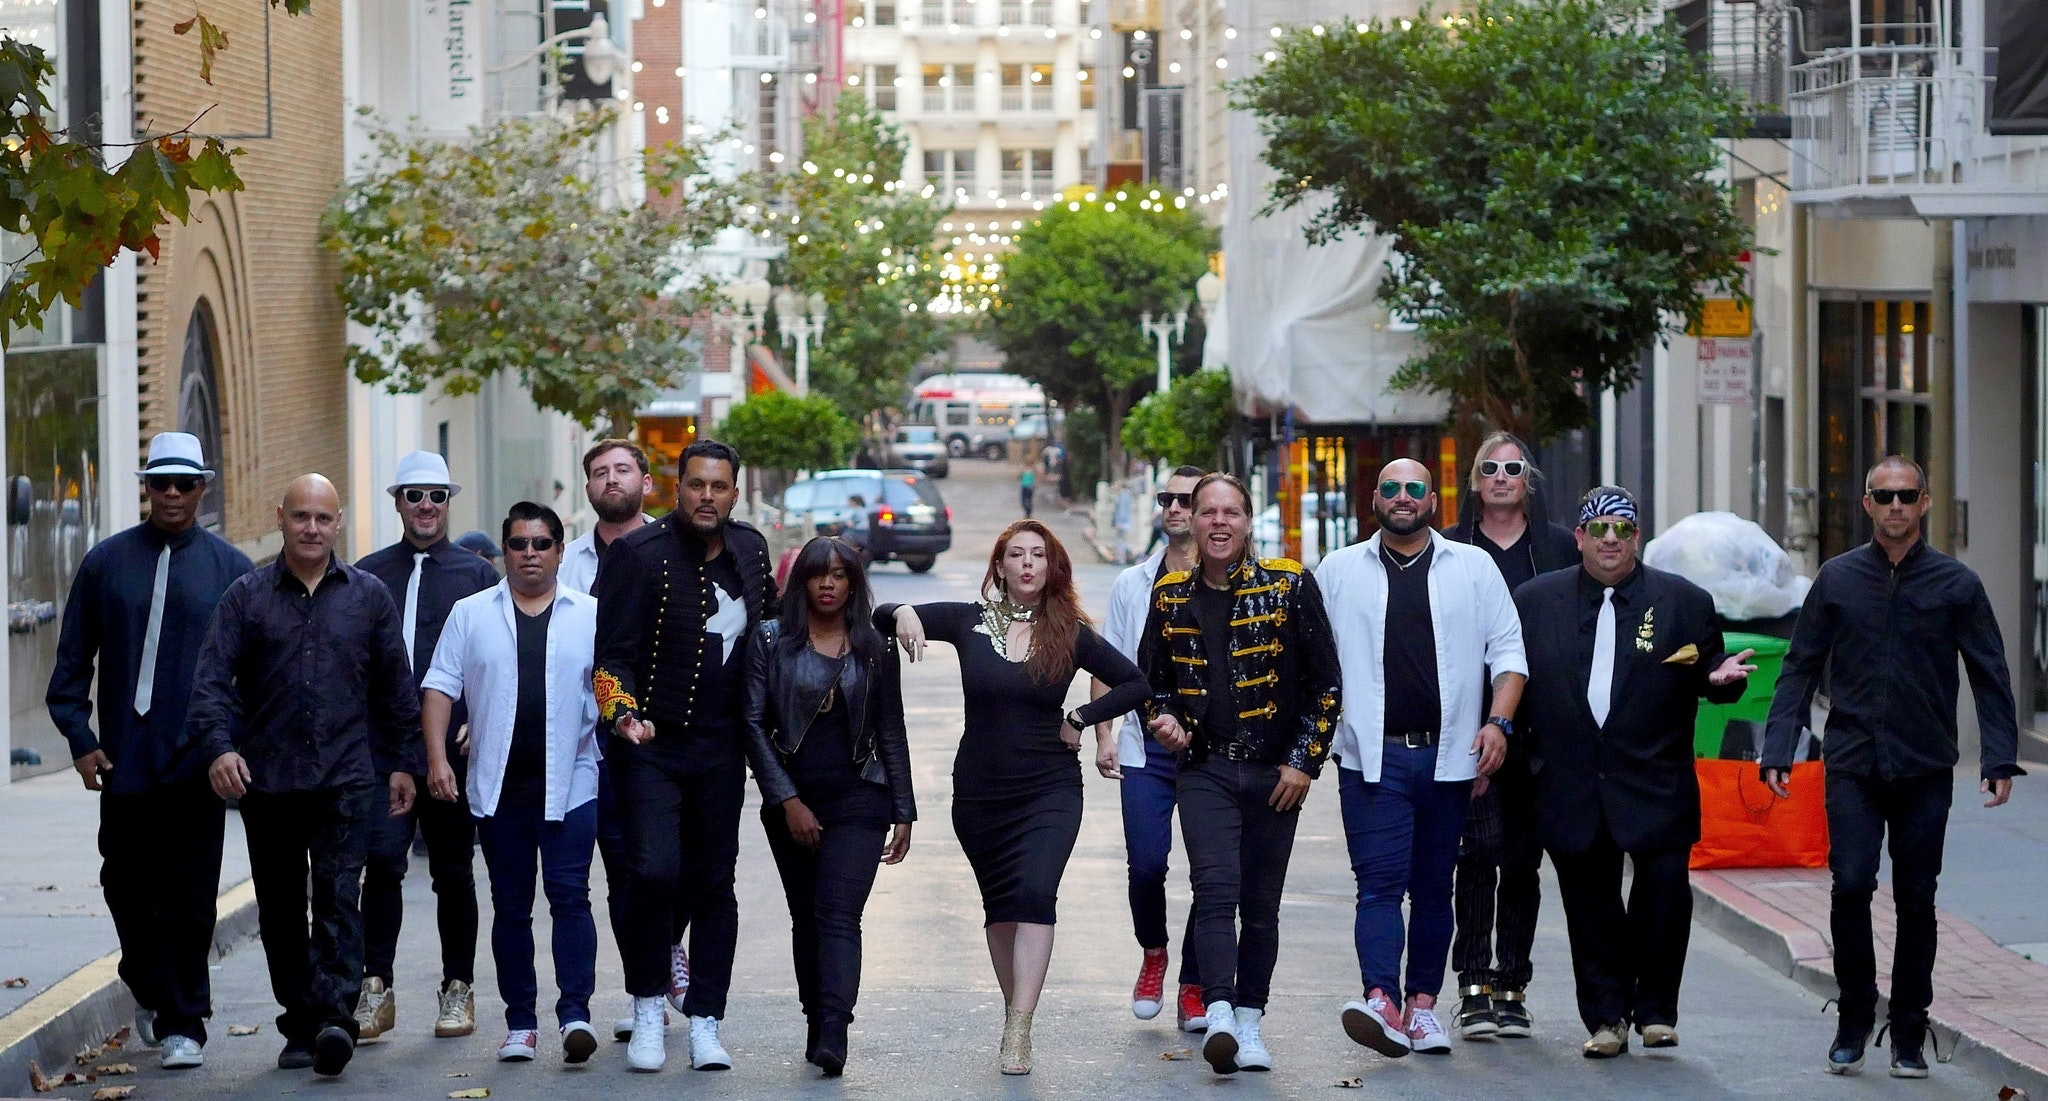 Top Michael Jackson Tribute Band